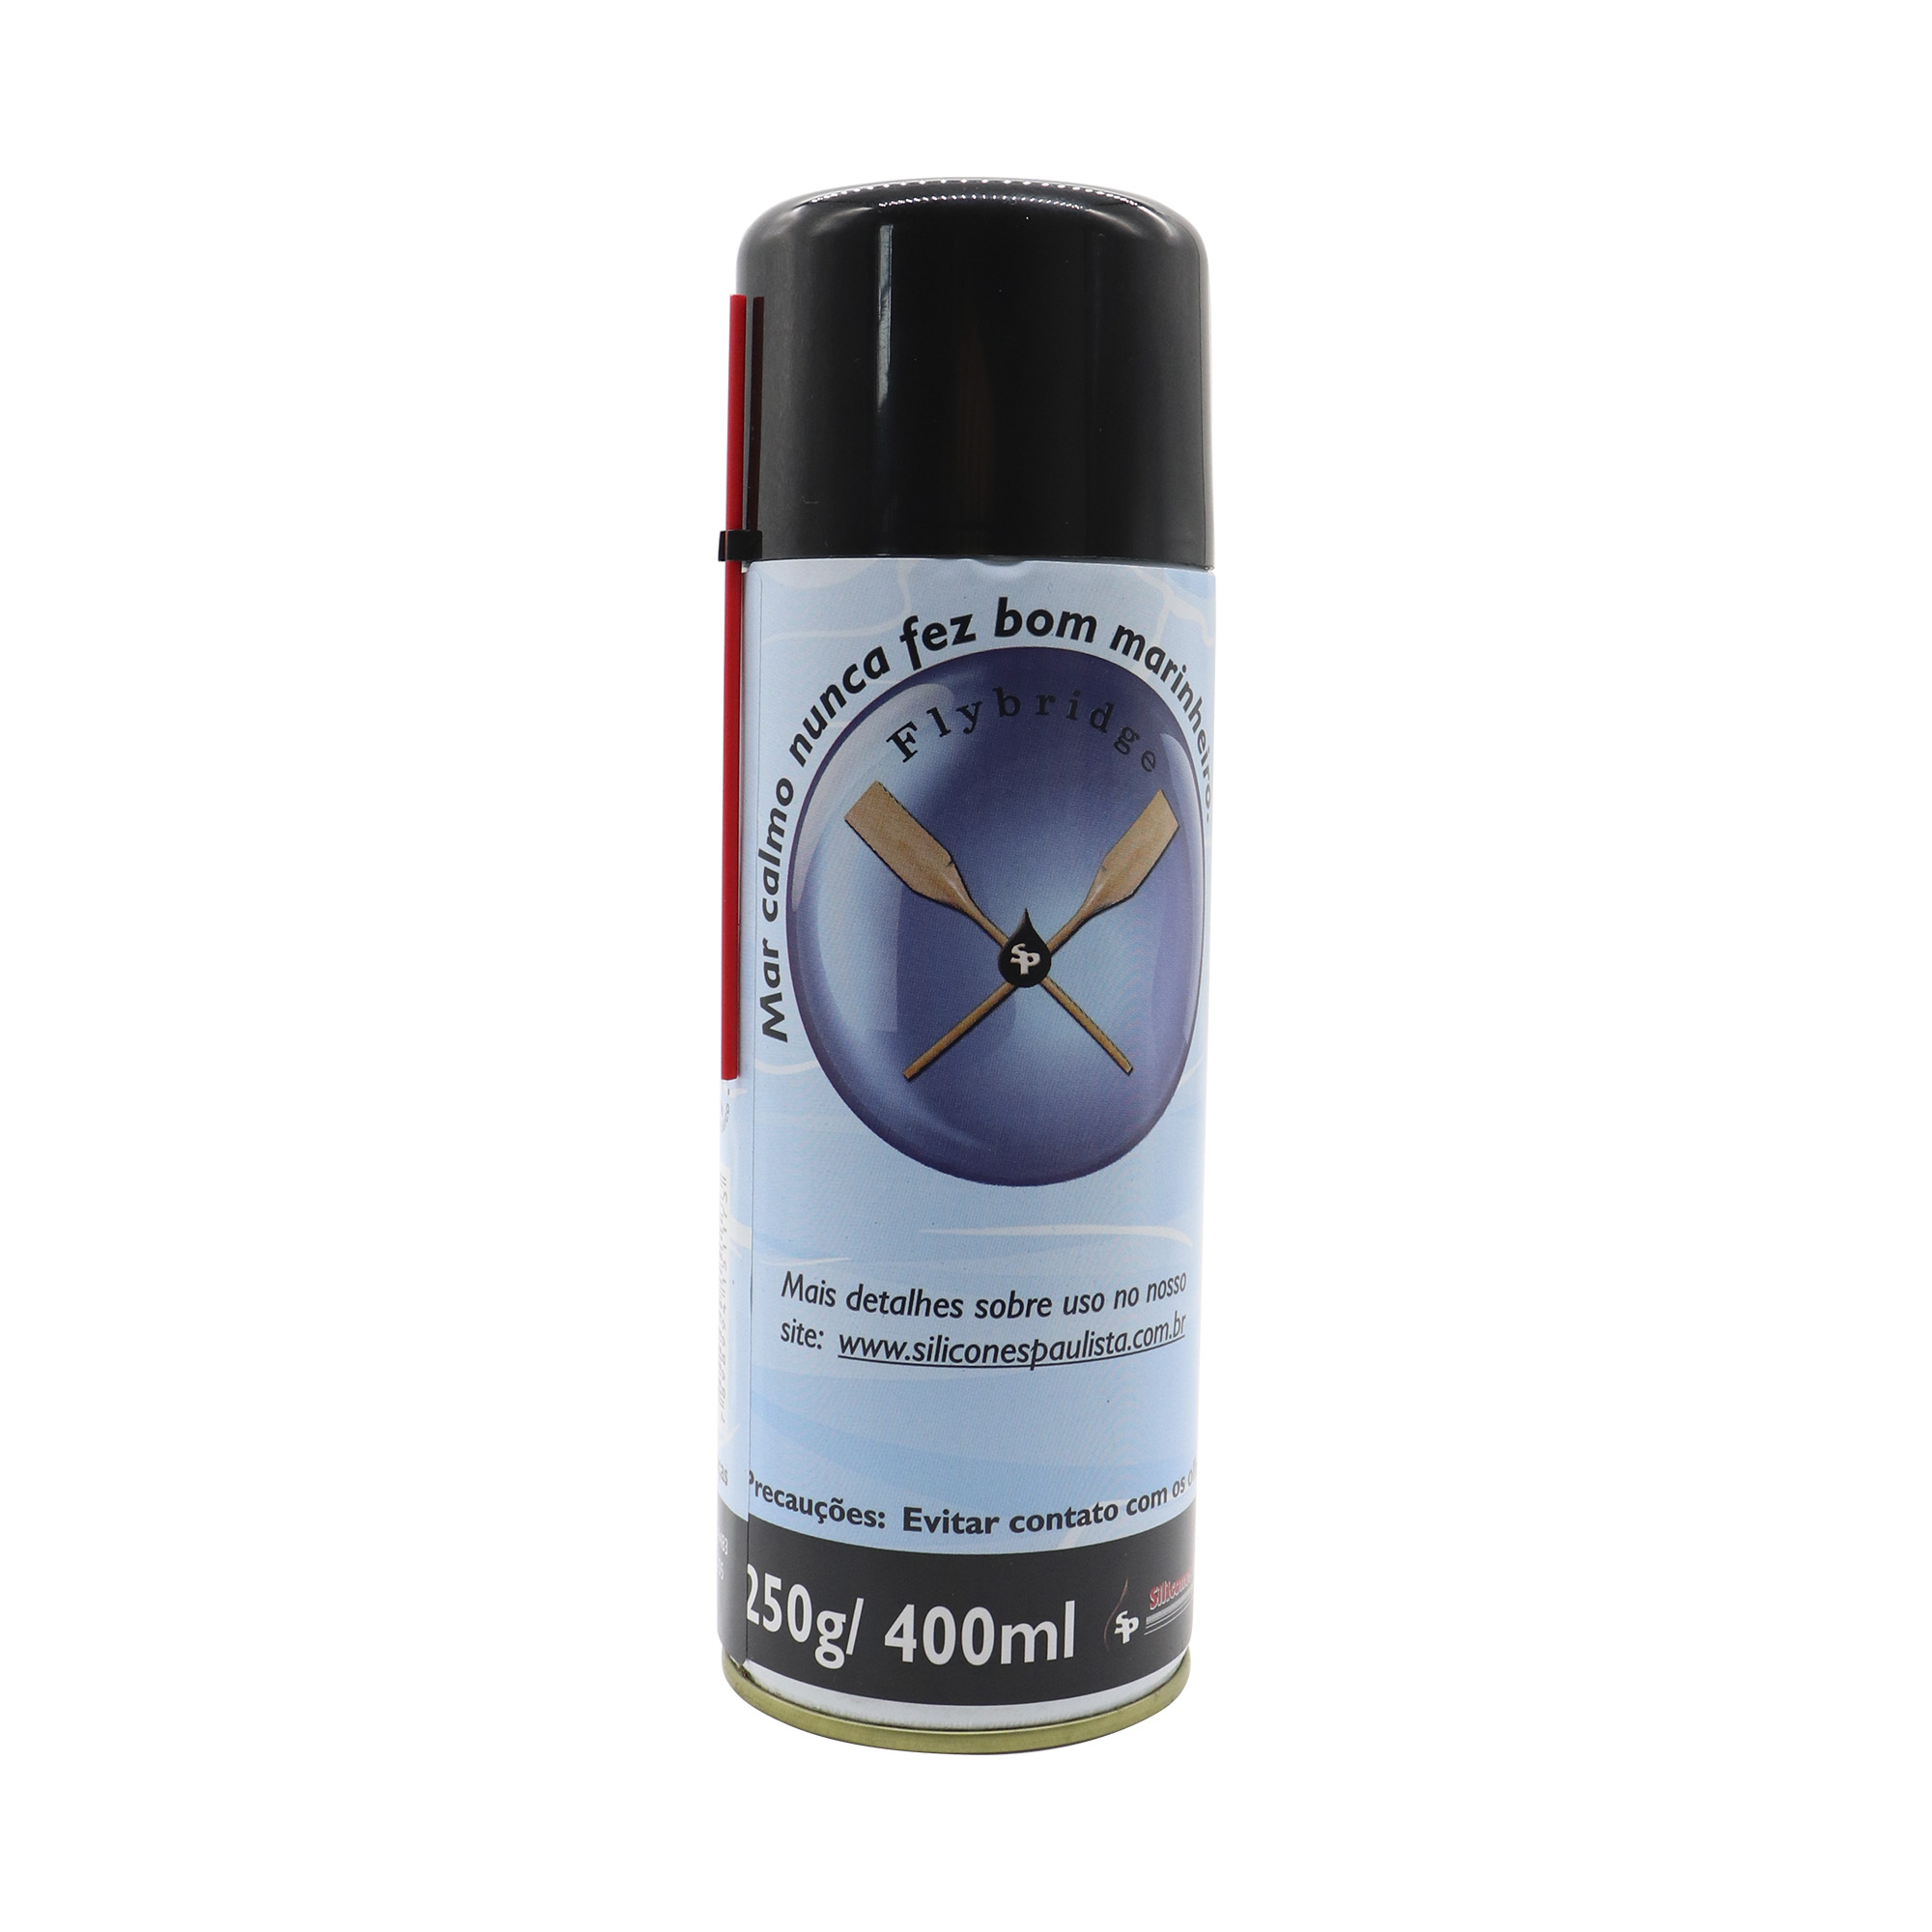 Spray de Silicone Náutico 400ml/250g